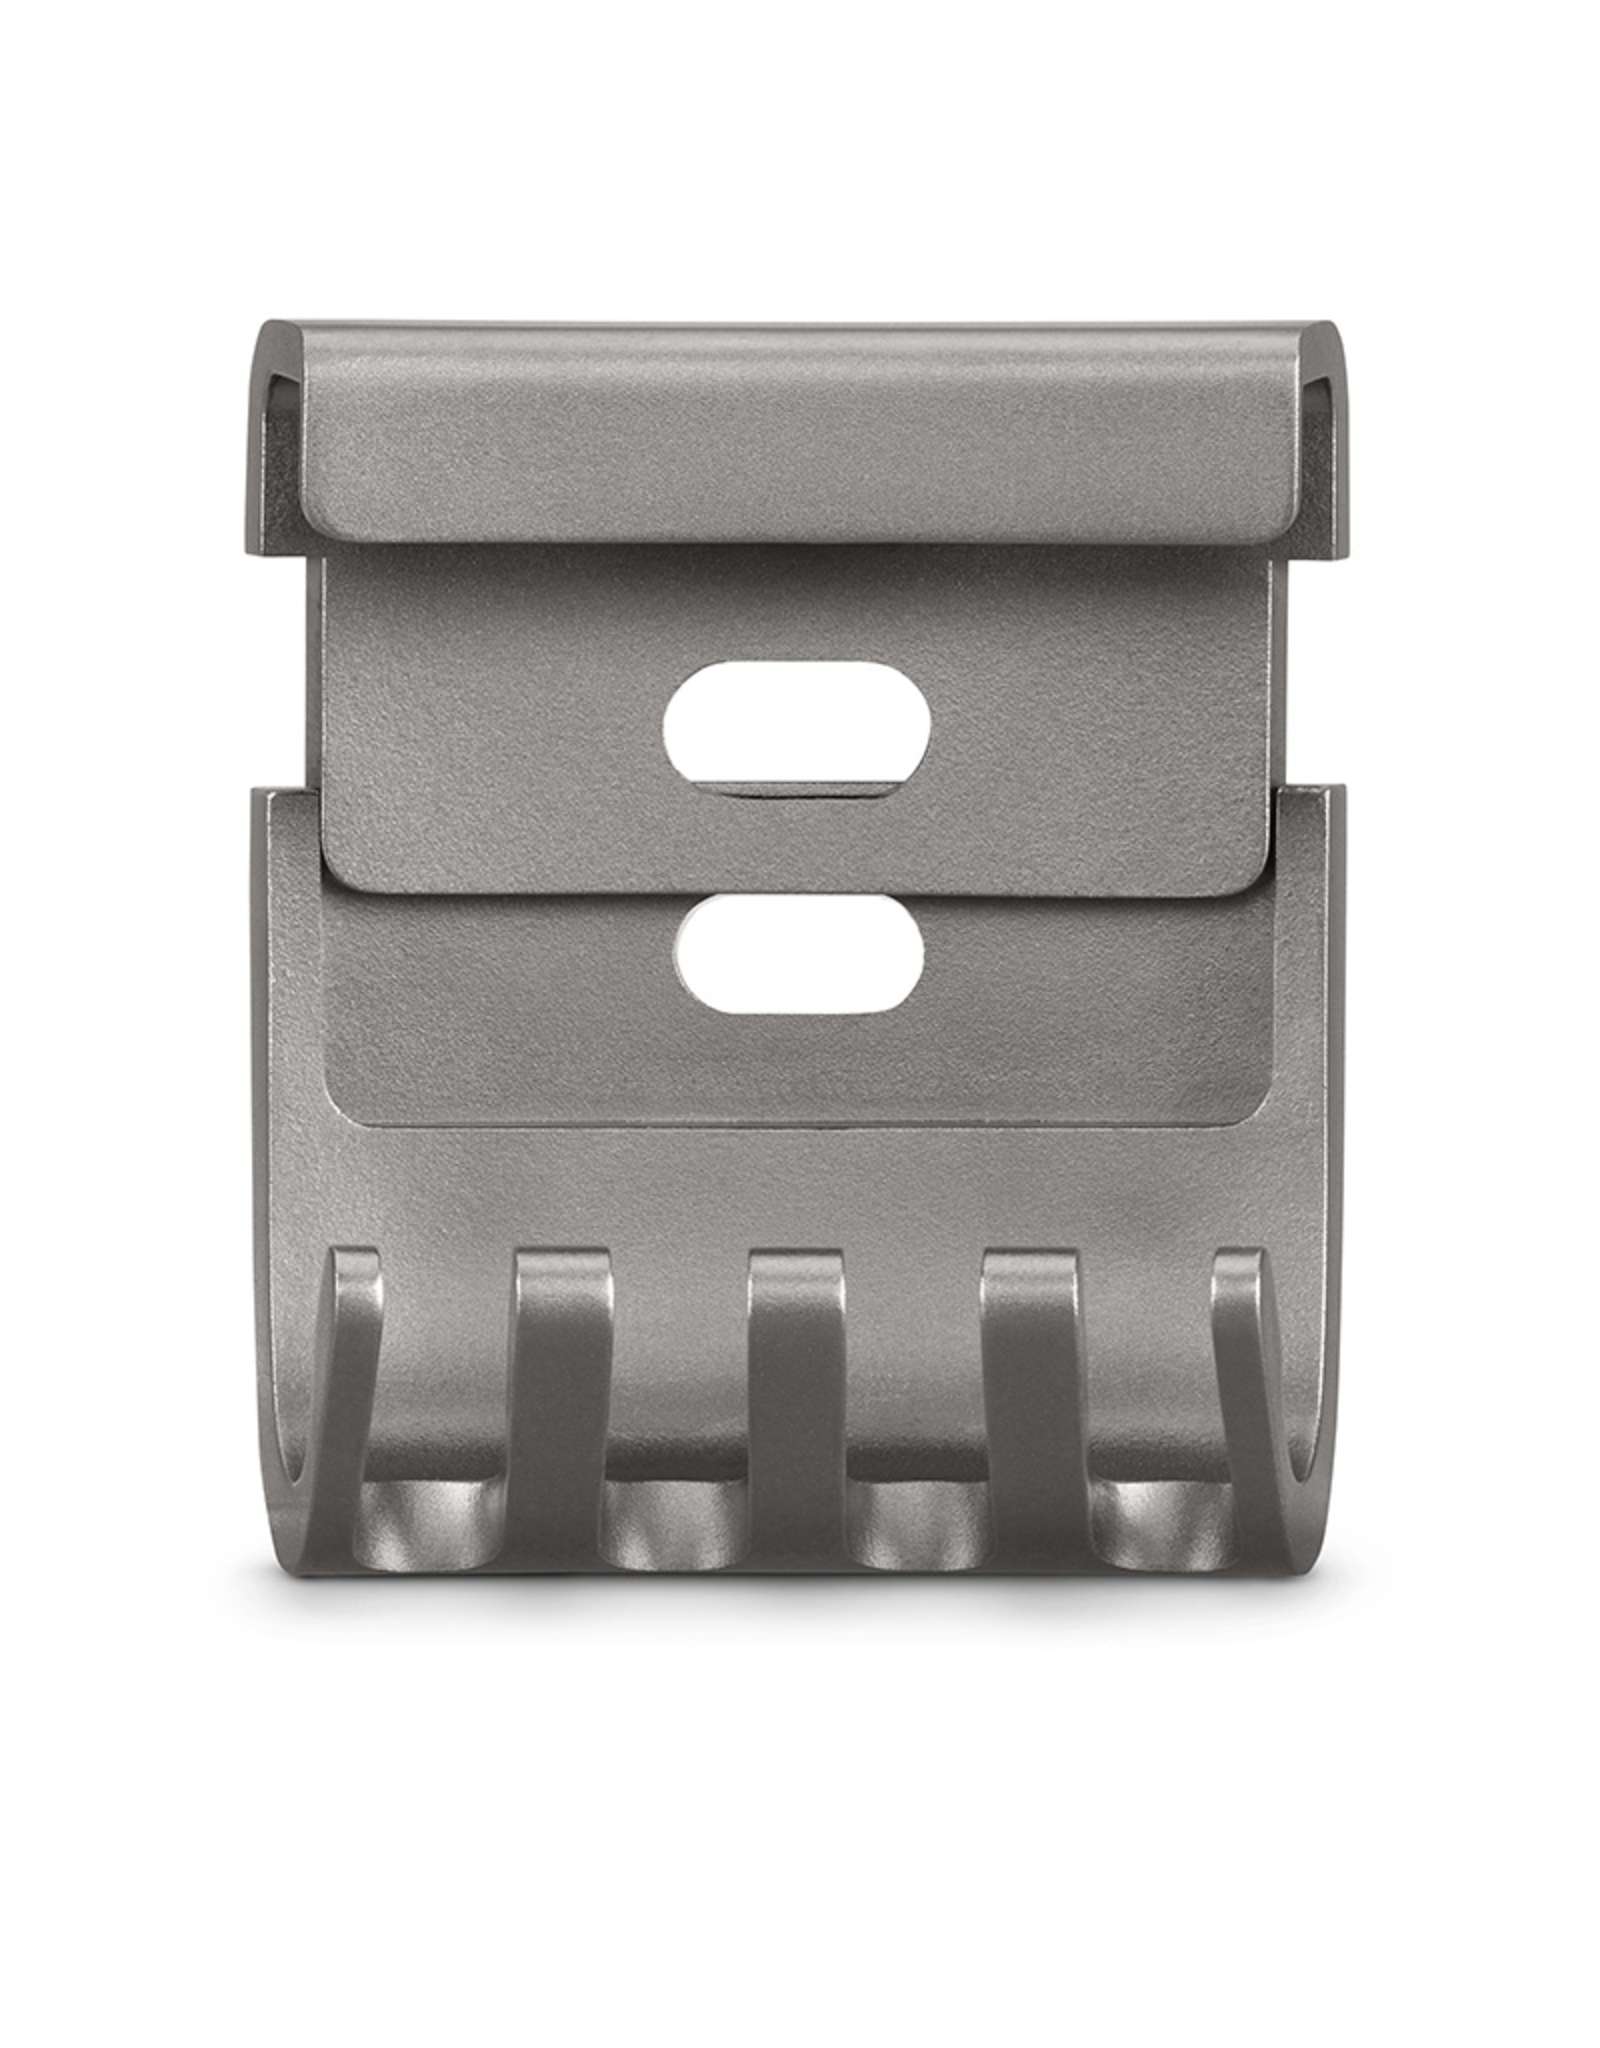 Apple Apple Mac Pro Security Lock Adapter